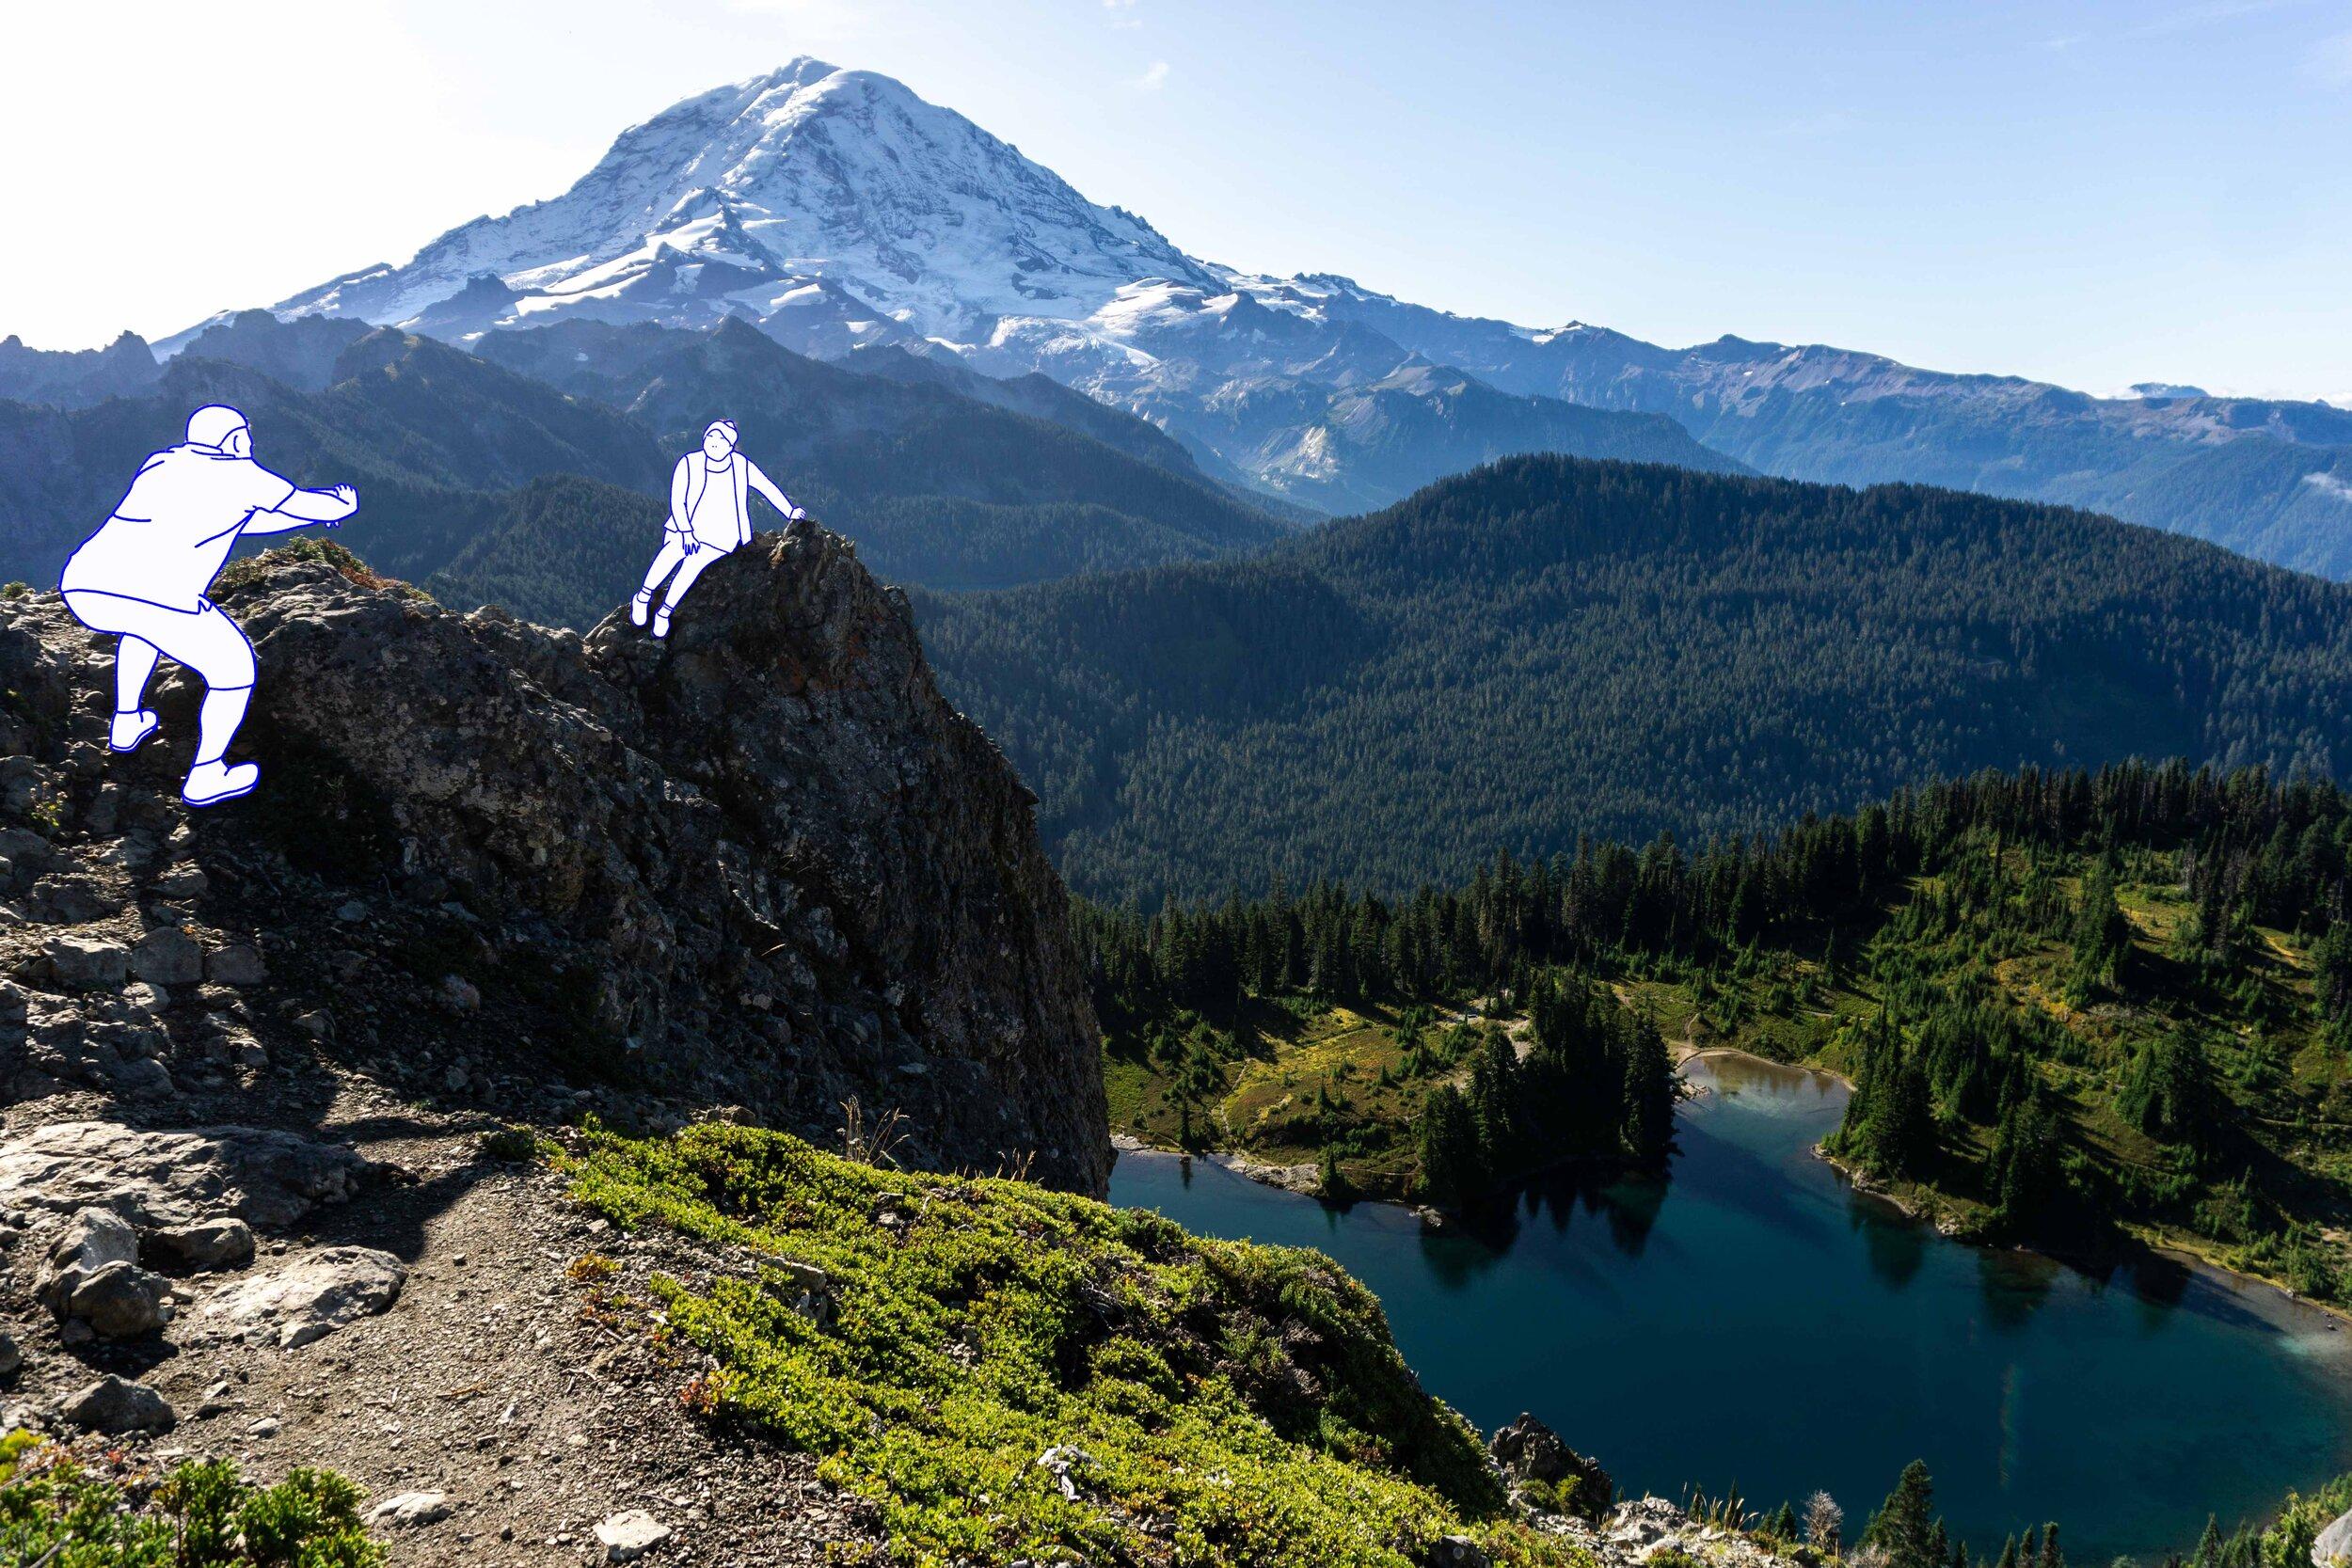 Mt. Rainier - Washington, United States